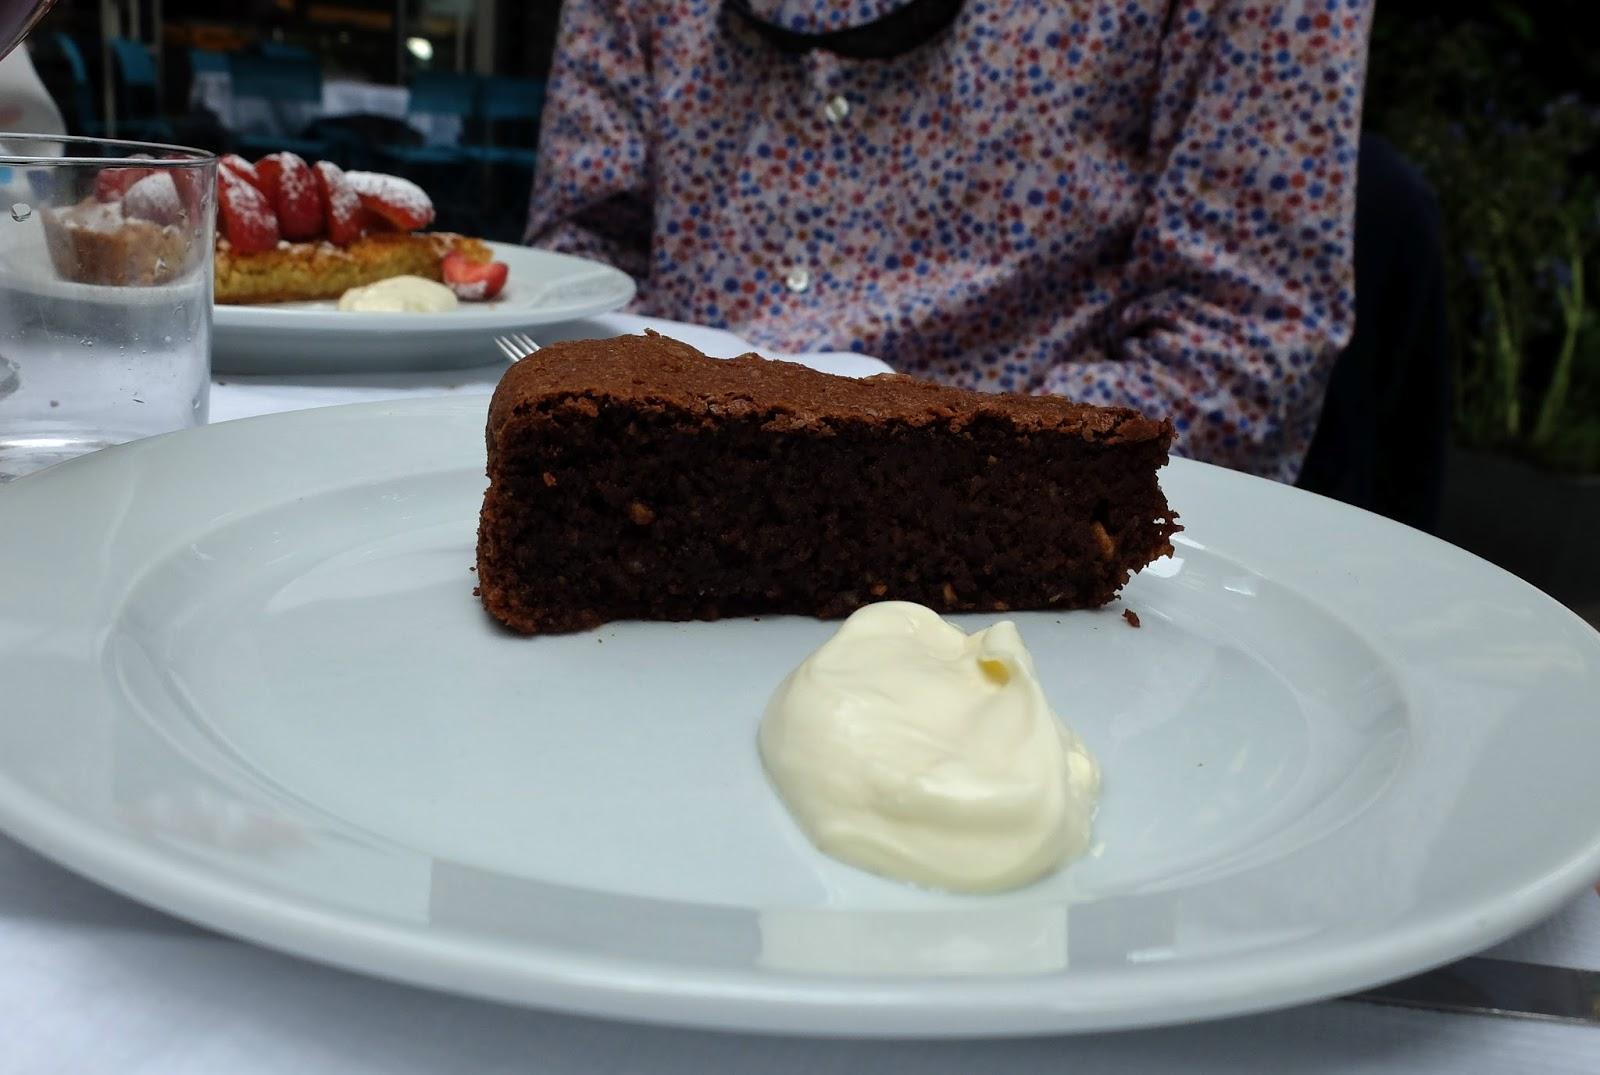 Honey & Ricotta: The River Café: the Story of the Cake